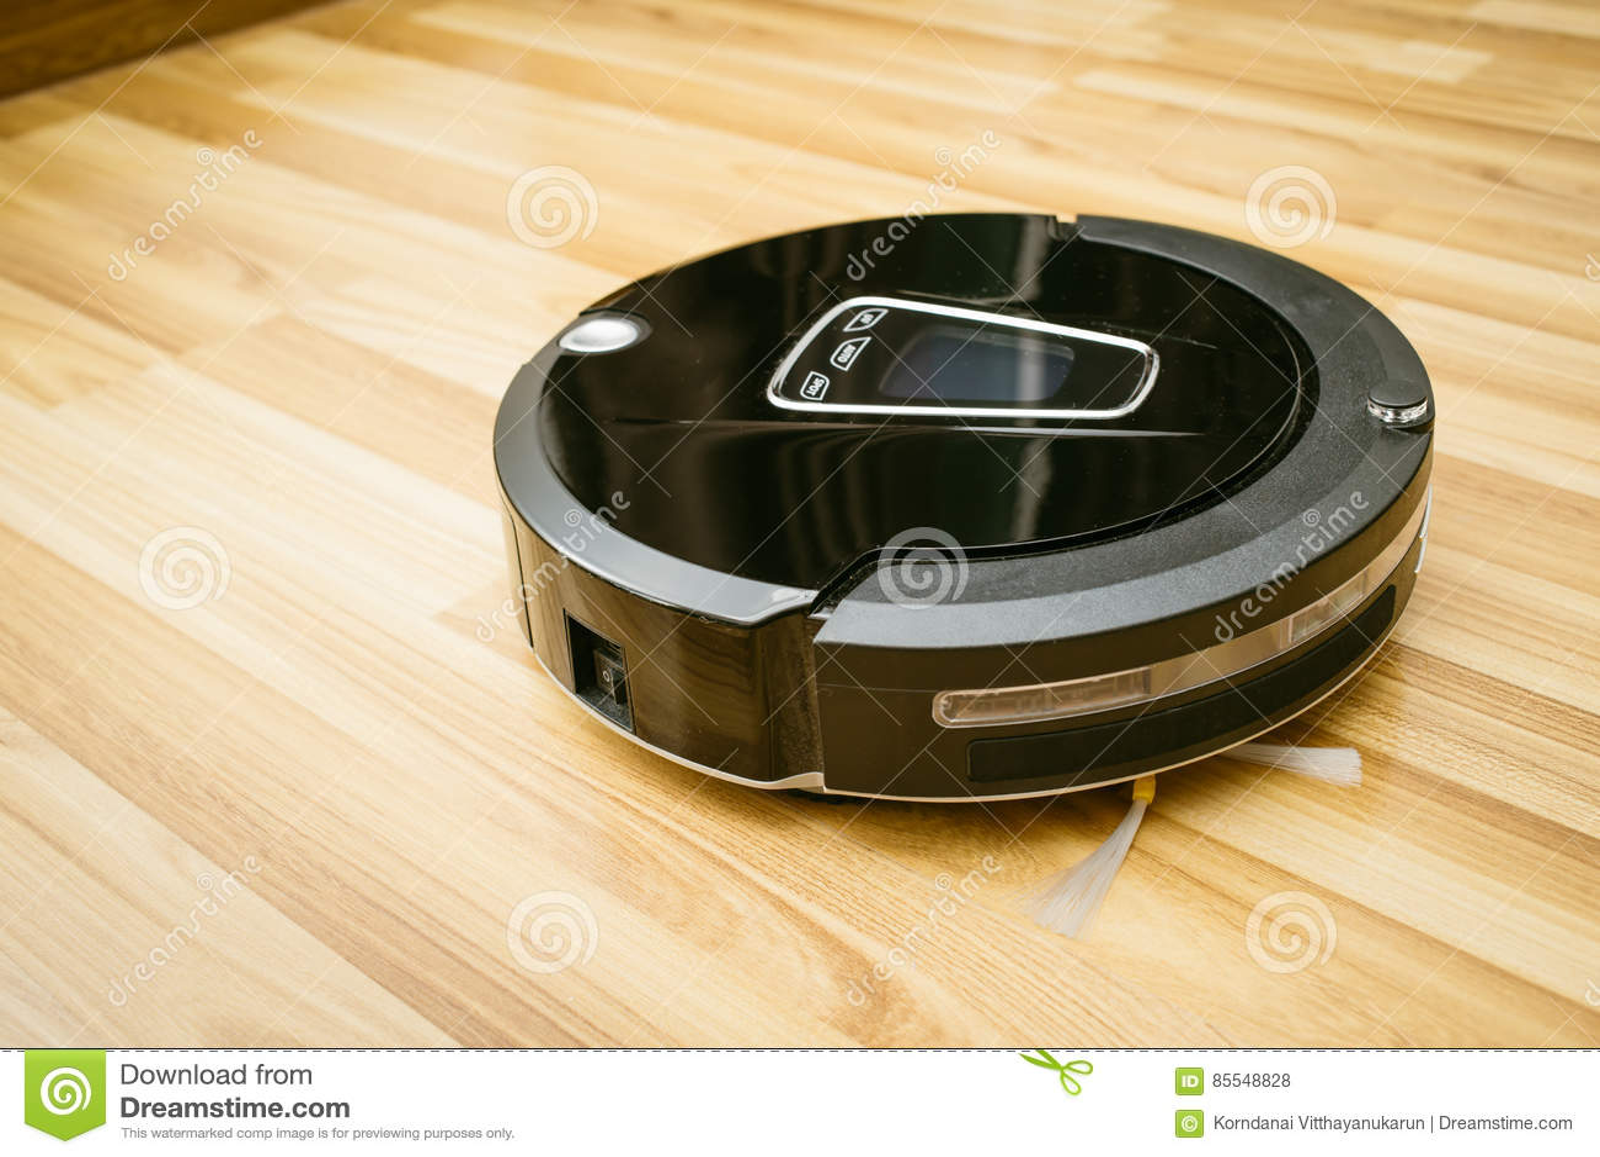 Robot Vacuum Cleaner On Laminate Wood Floor Stock Photo